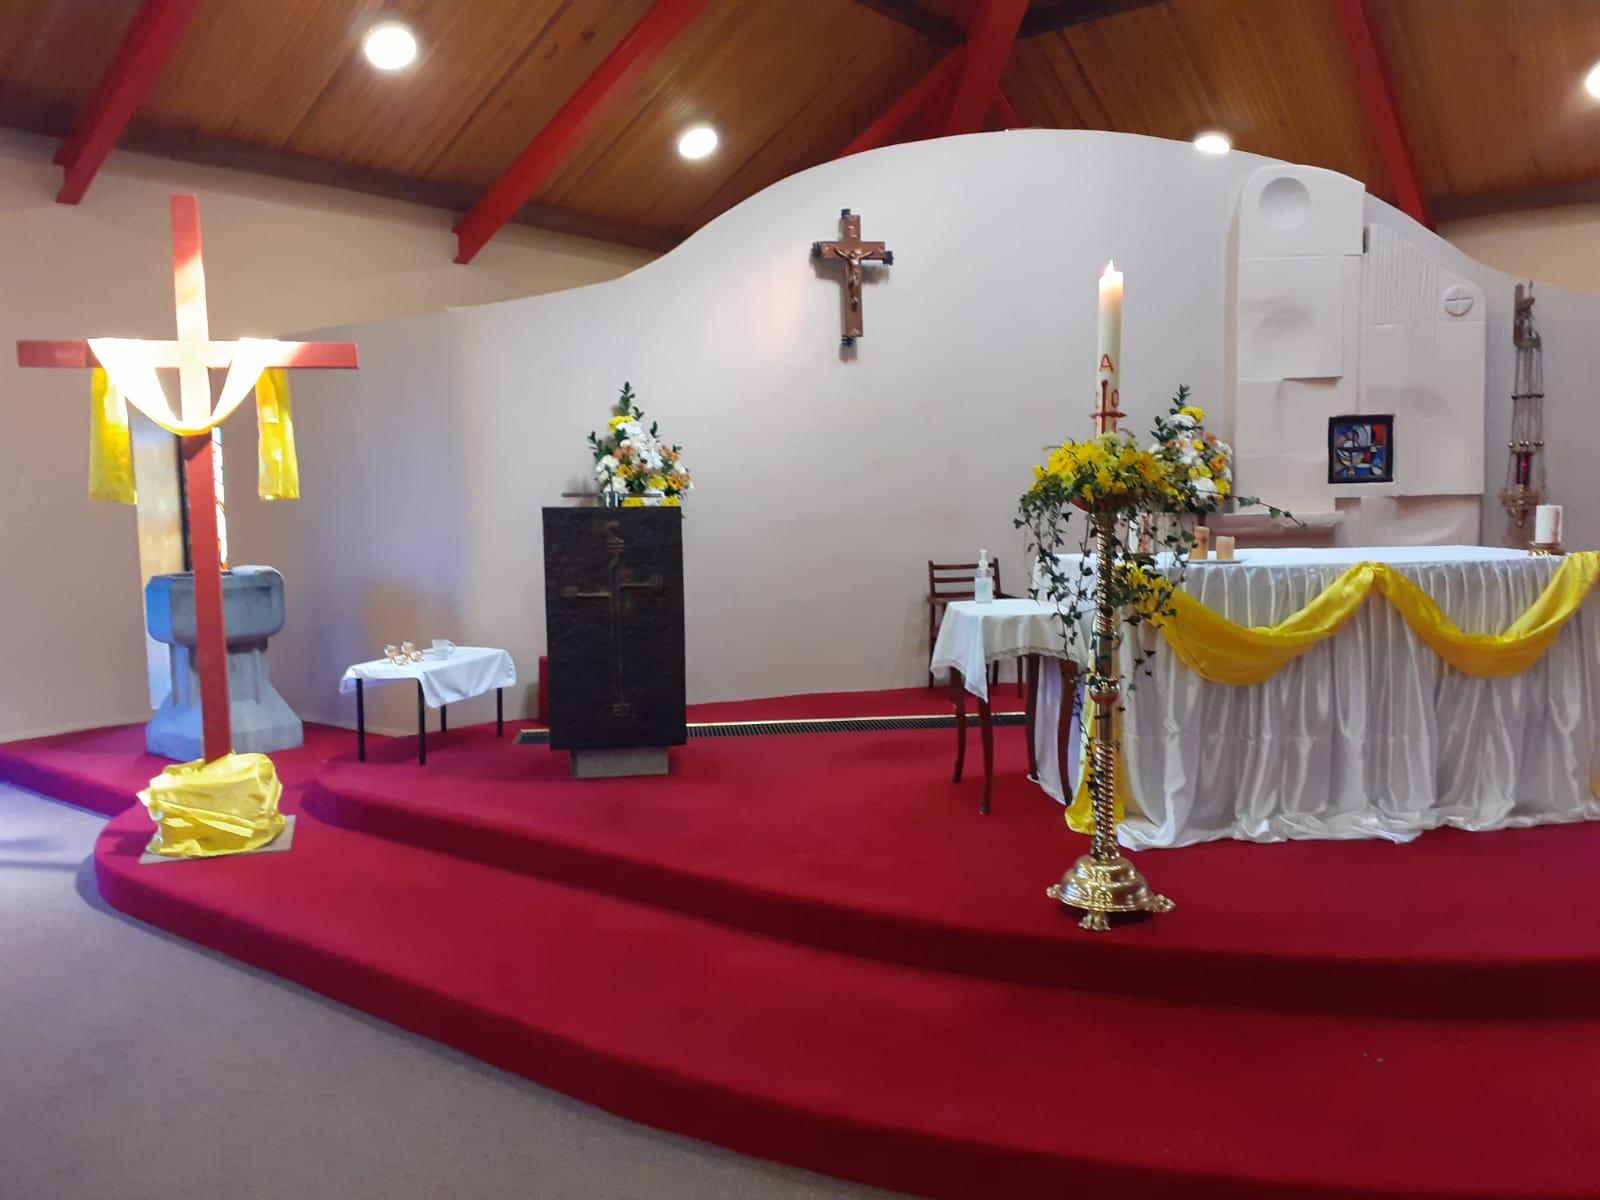 Patrickswell Church - Eastertide 2021